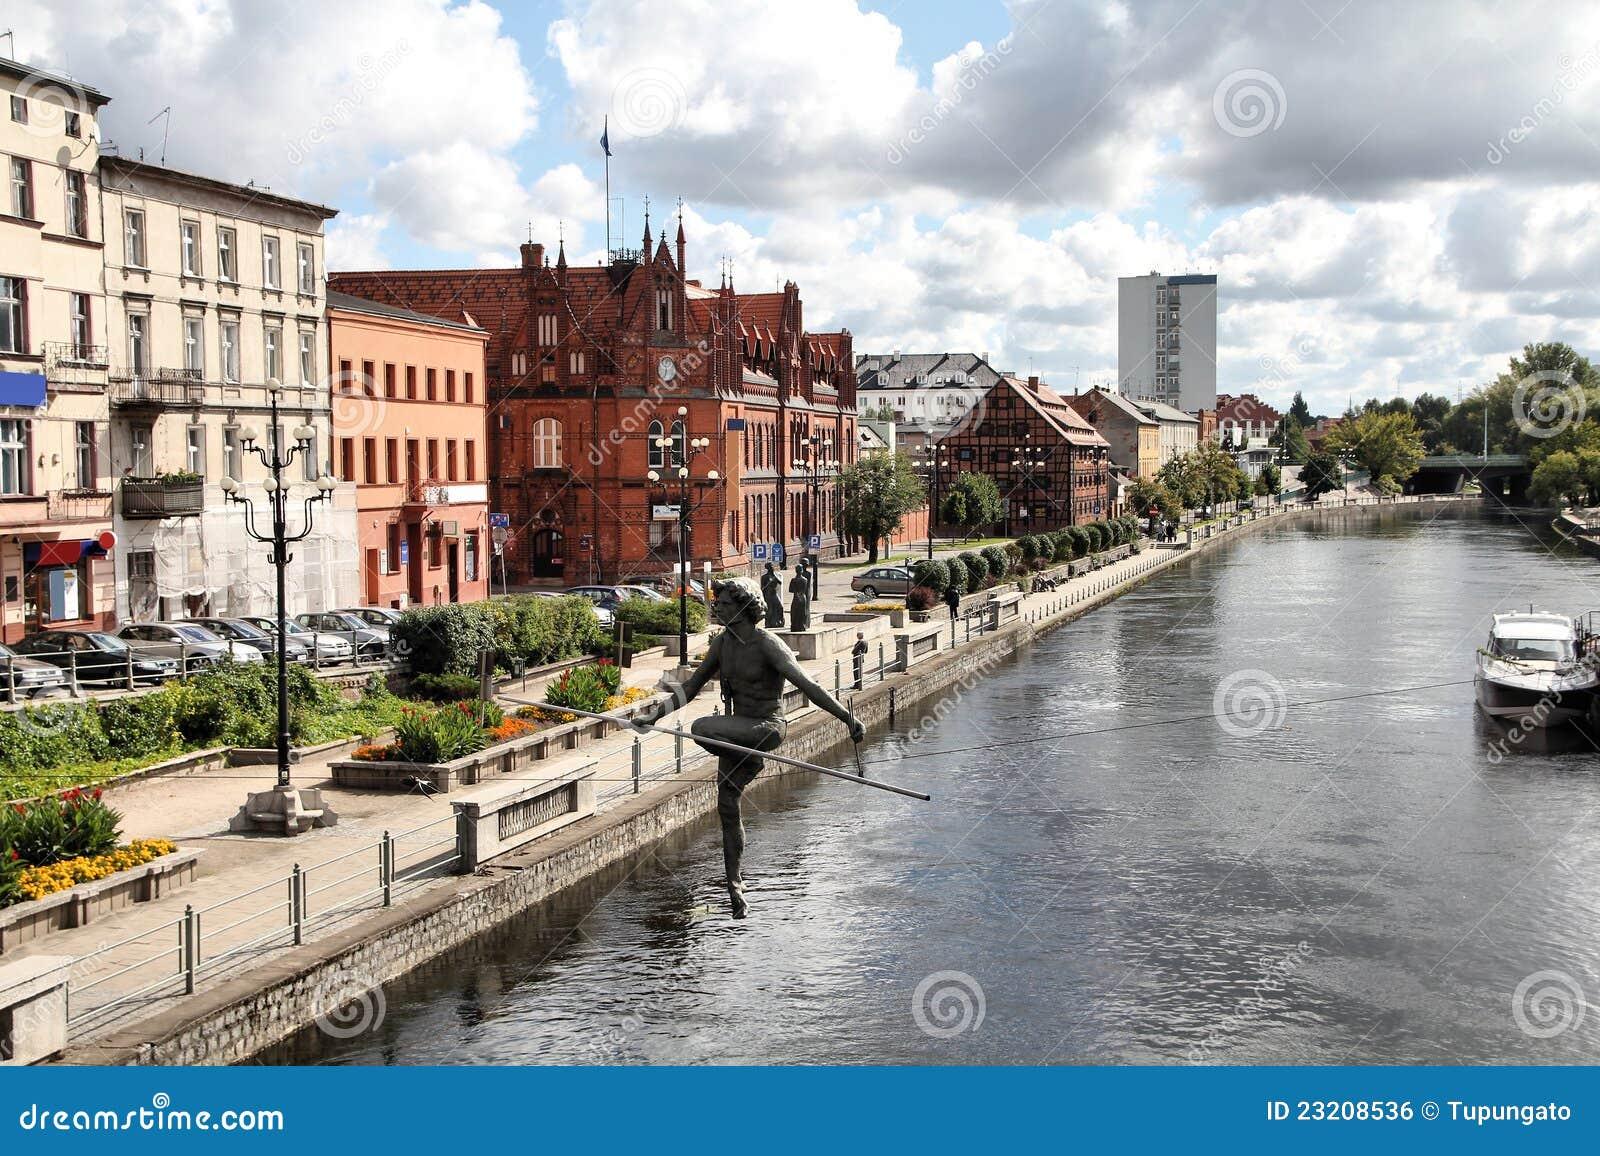 Bydgoszcz Poland  city photos gallery : Bydgoszcz, Poland Royalty Free Stock Image Image: 23208536